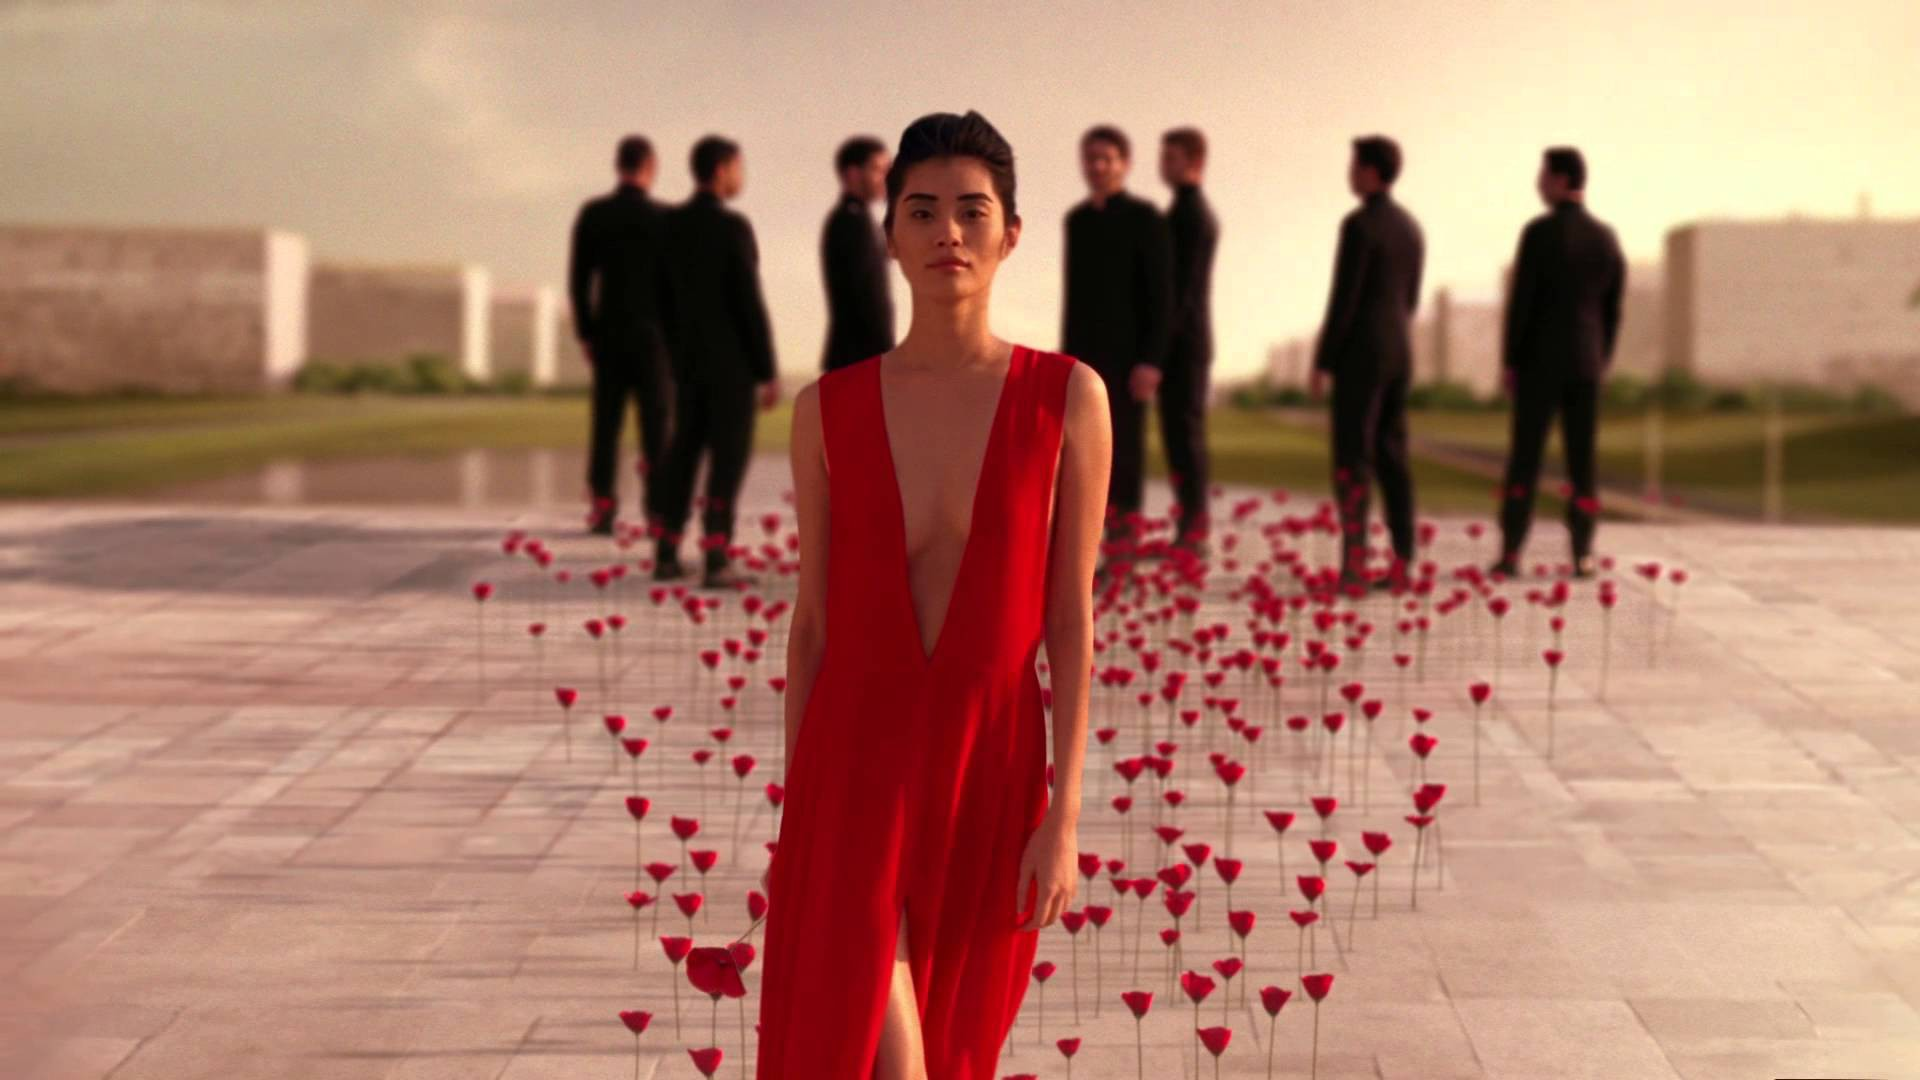 Кадр из рекламной кампании Flower by Kenzo L'Elixir с Минг Си